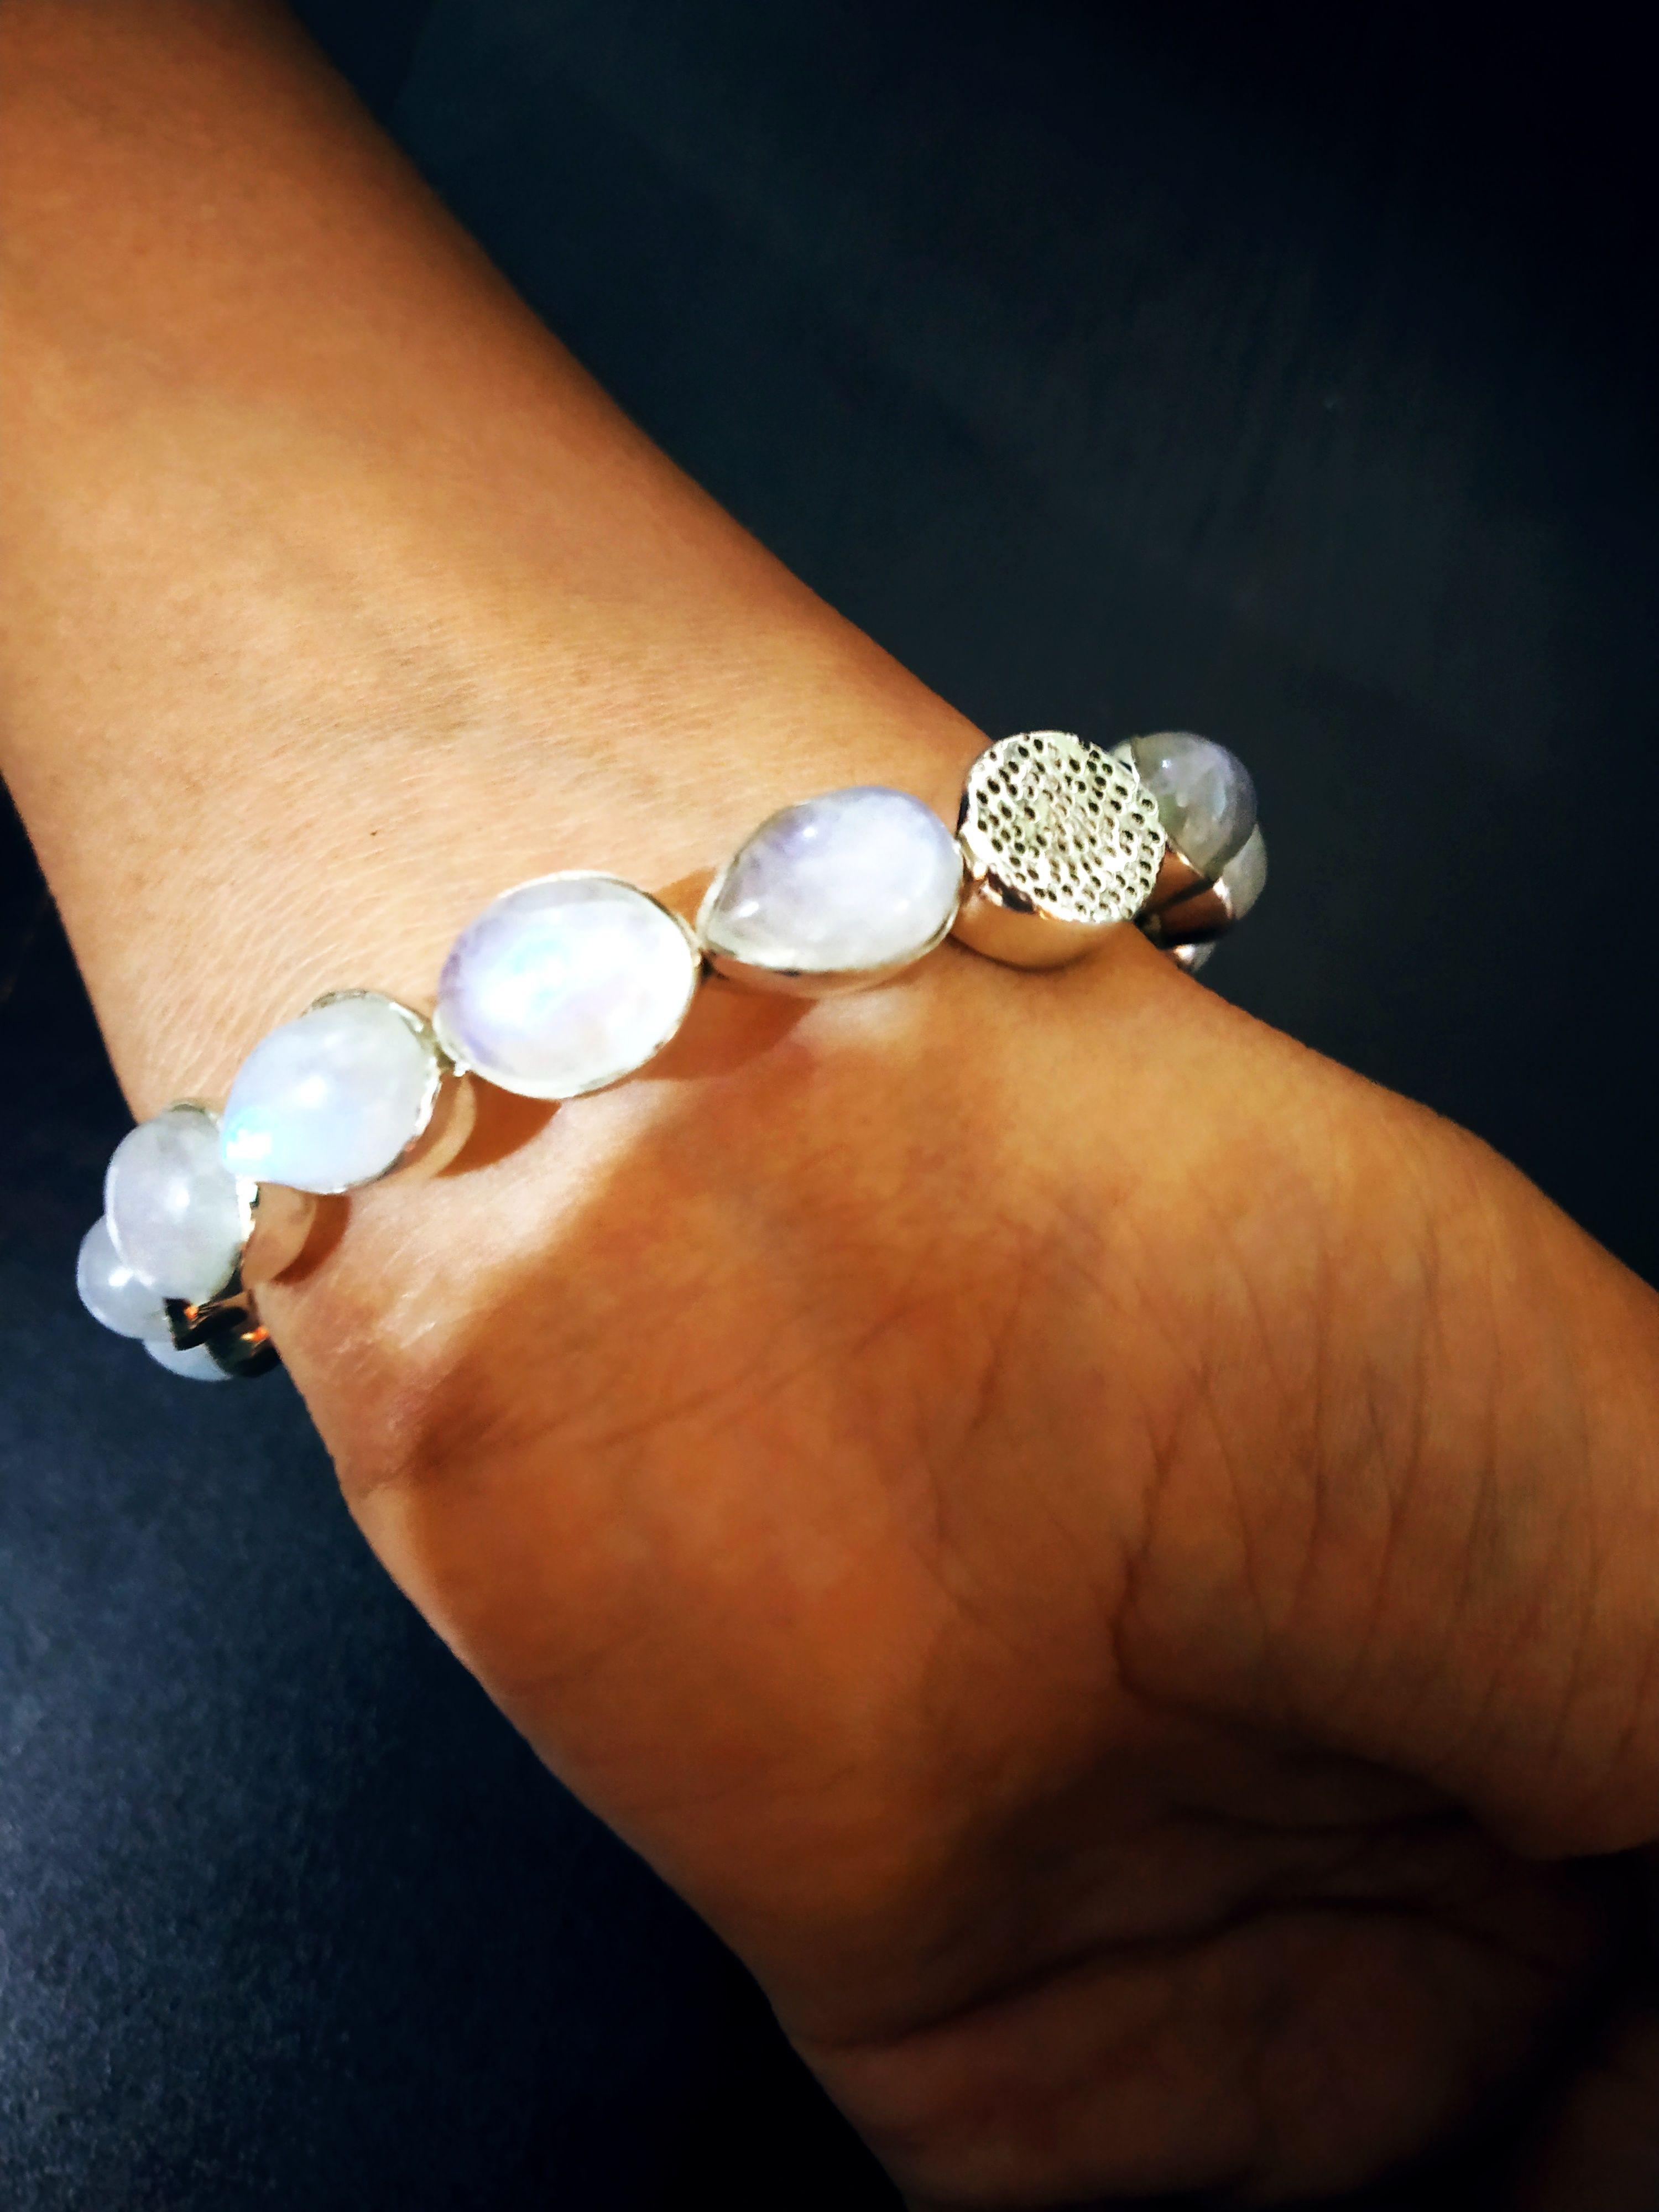 Oval Moonstone Bracelet Vintage Quartz Bracelet Healing Crystal Mystical Moonstone Bracelet Sterling Silver Bracelet Vintage Jewelry